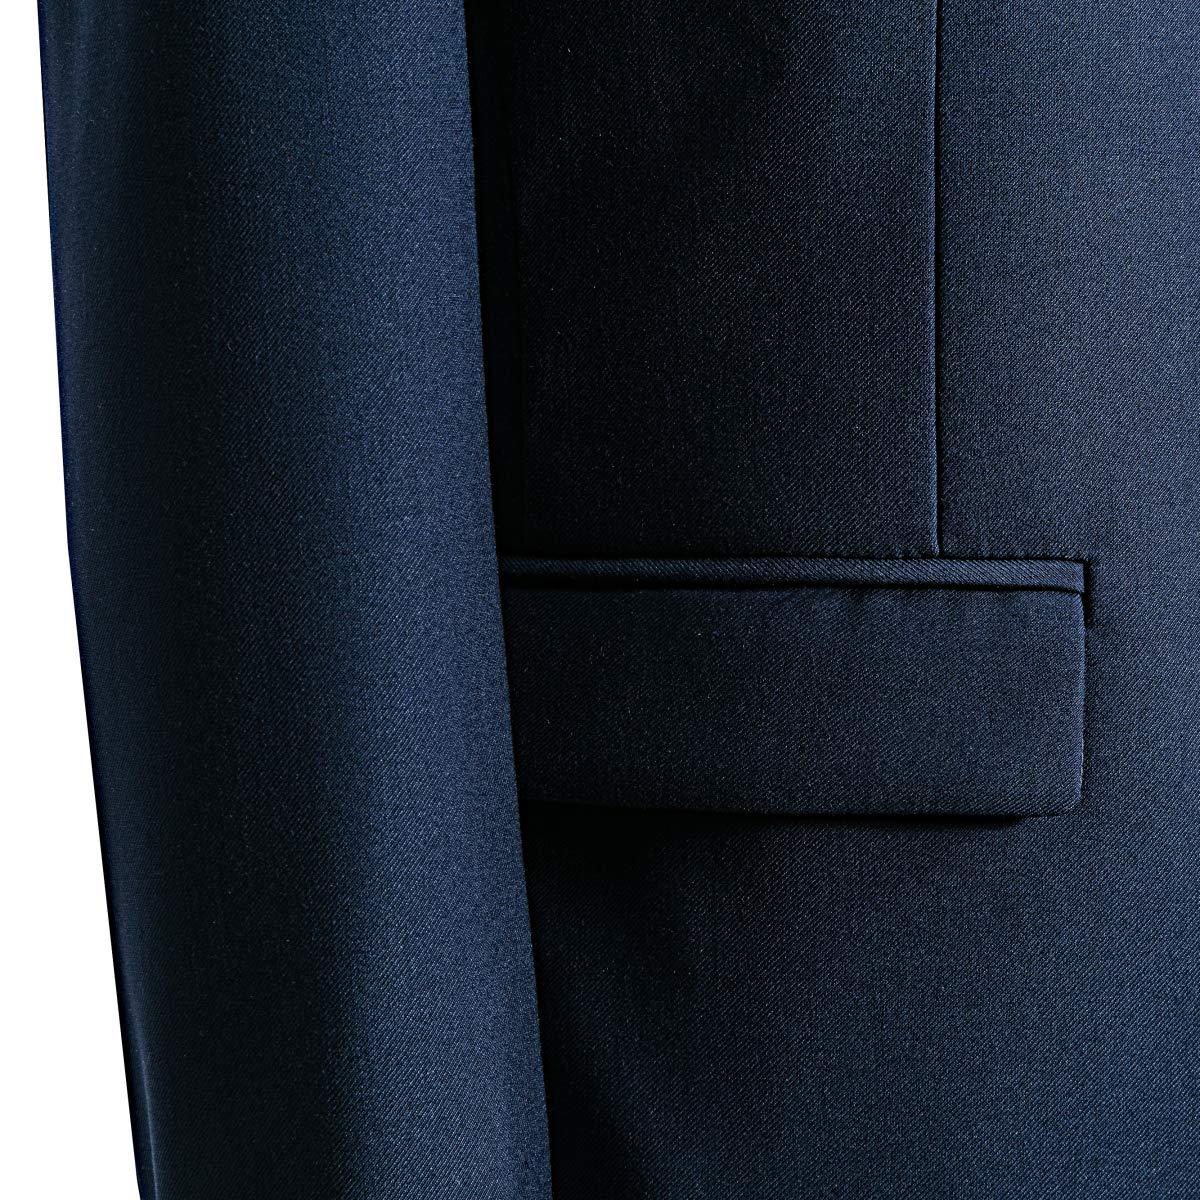 MAGE MALE Mens 3 Pieces Suit Elegant Solid Two Button Slim Fit Single Breasted Party Blazer Vest Pants Set